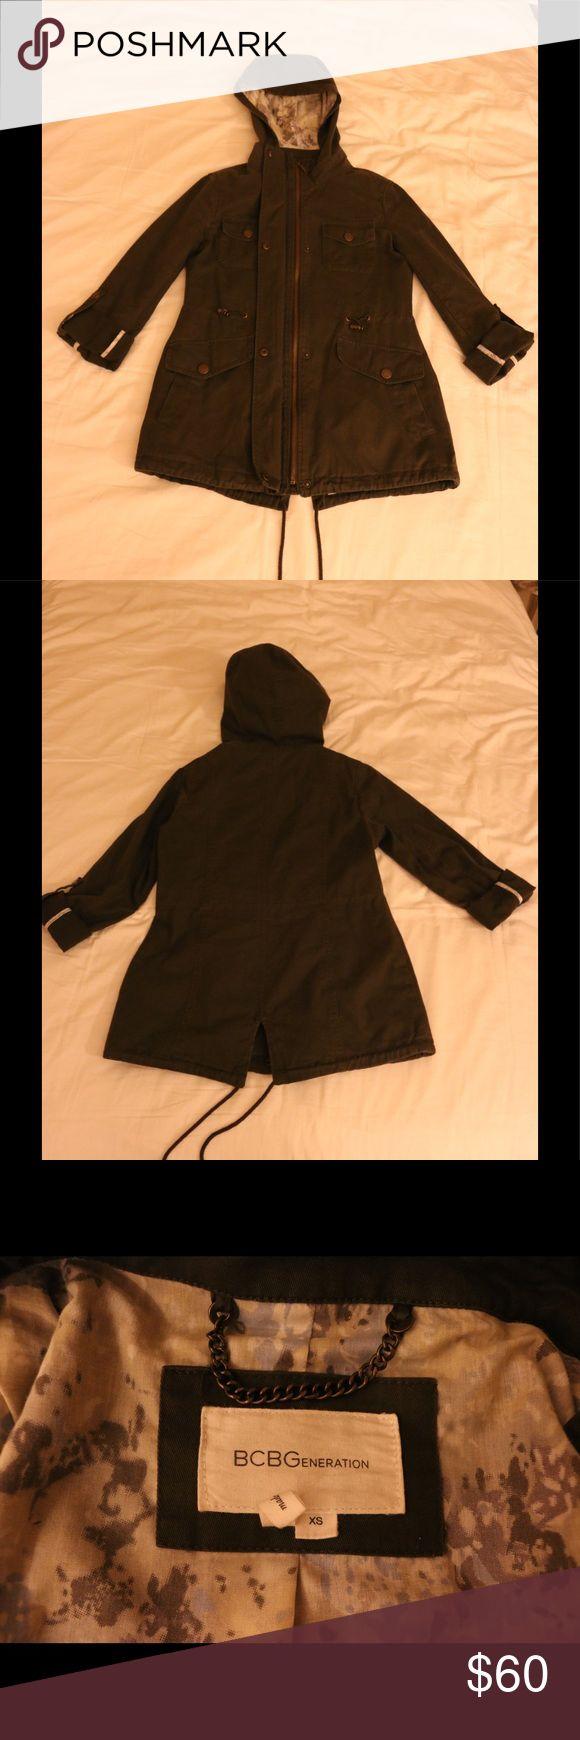 BCBGeneration army green jacket BCBGeneration army green jacket. Worn a few times, in good condition. BCBGeneration Jackets & Coats